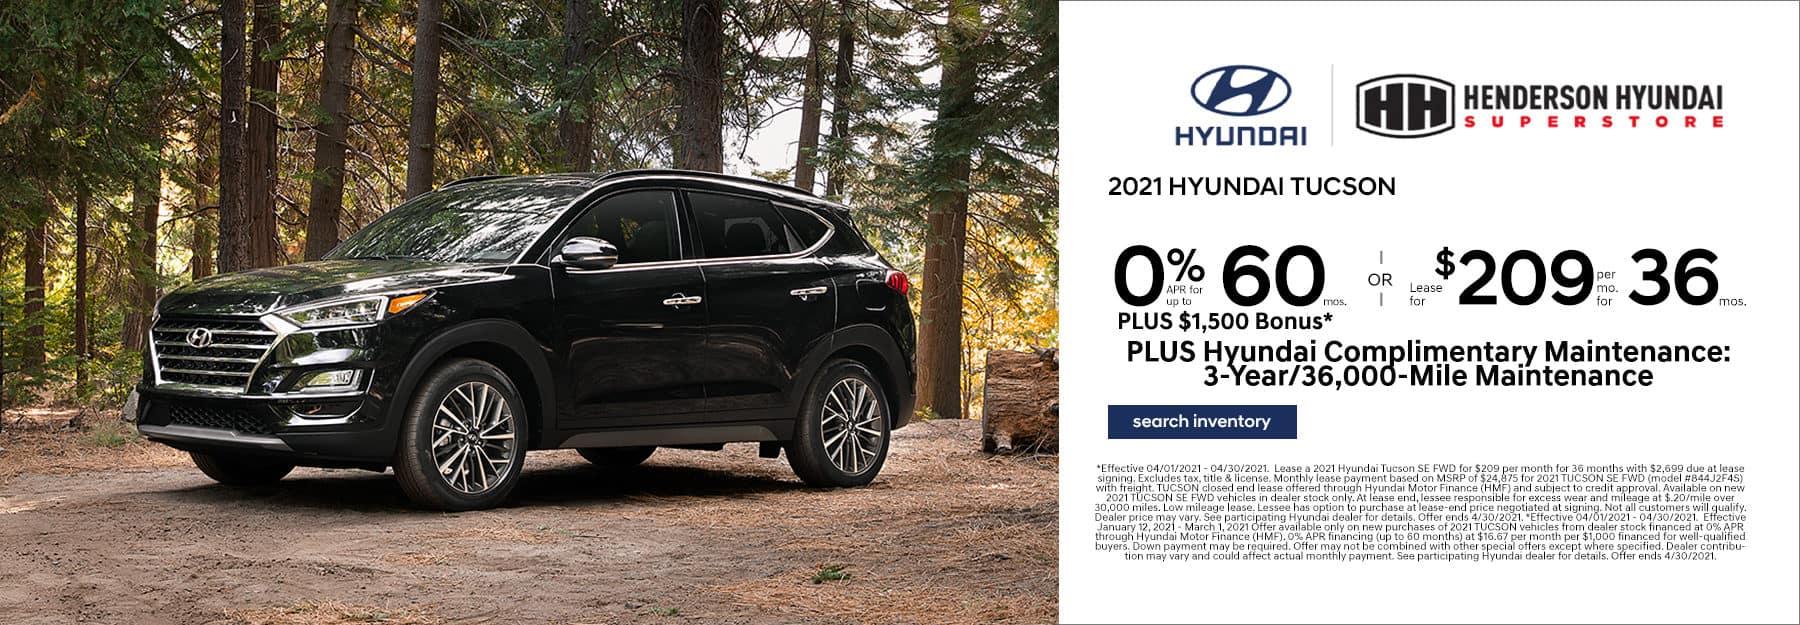 April_2021_TUCSON_Henderson Hyundai